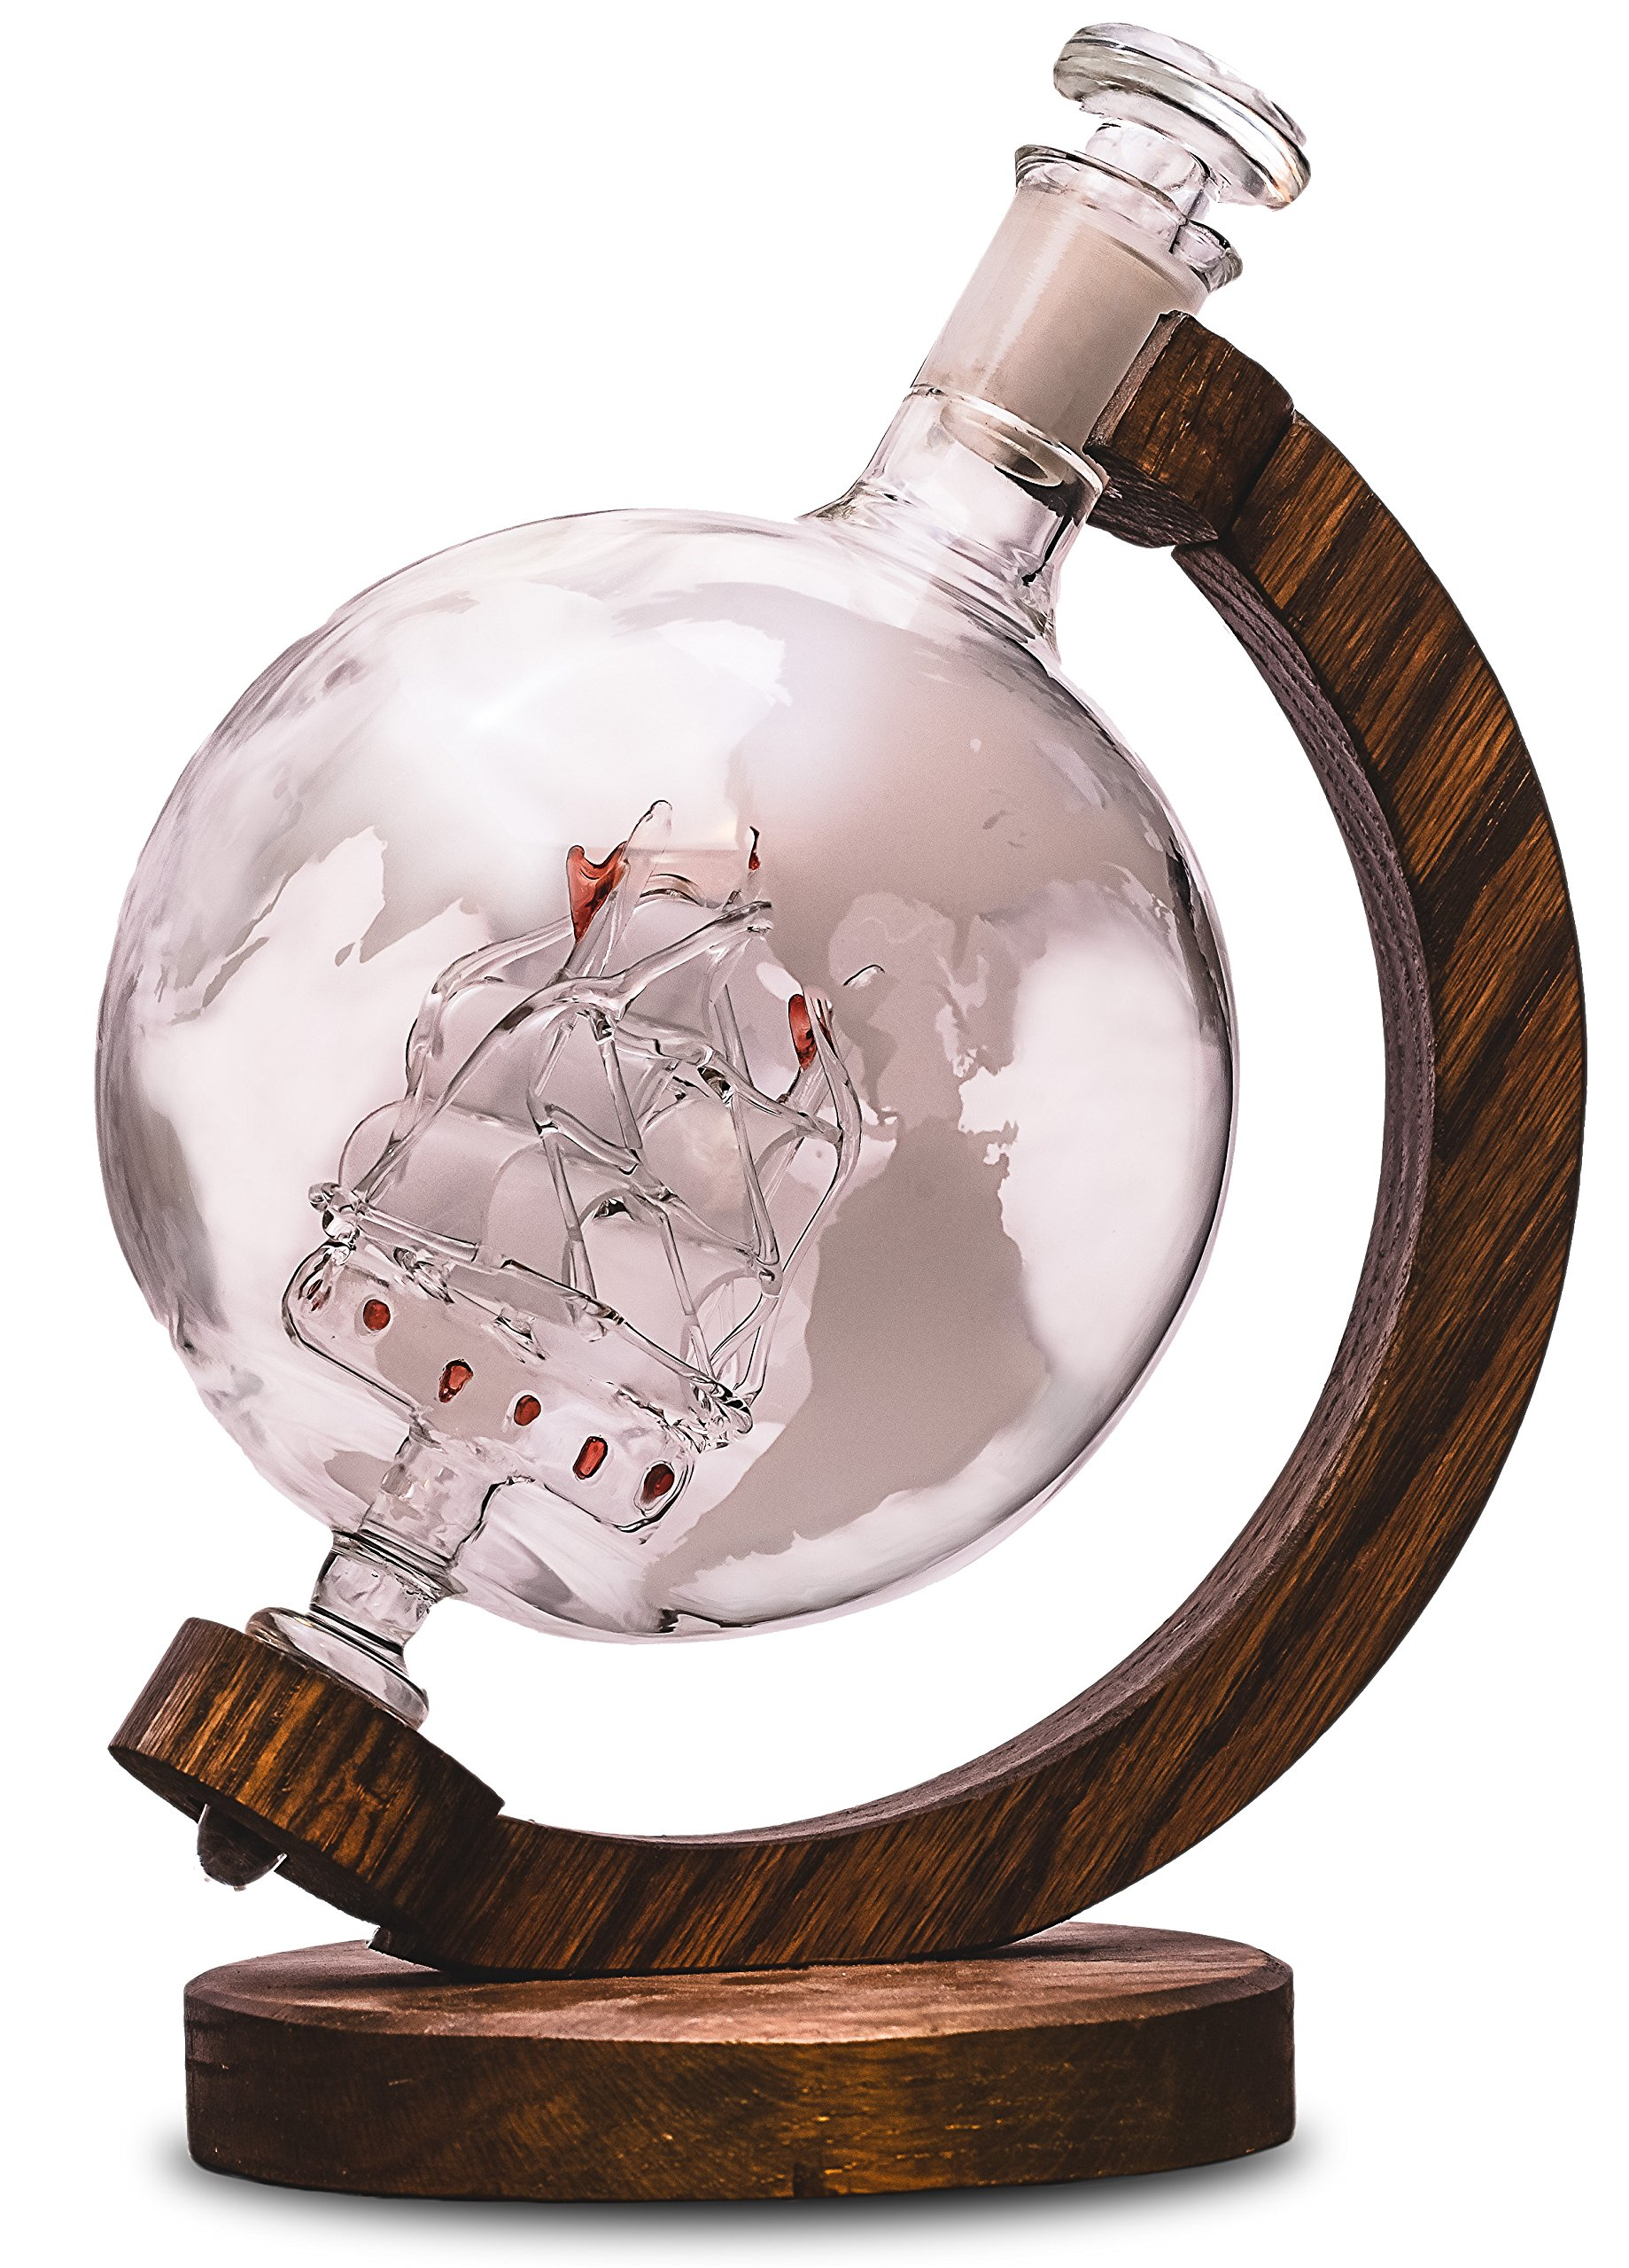 Etched Globe Liquor Decanter - Scotch Whiskey Decanter - 1000ml Glass Decanter for Alcohol - Vodka, Bourbon, Rum, Wine, Tequila or Mouthwash - Prestige Decanters (Magellan's Victoria)